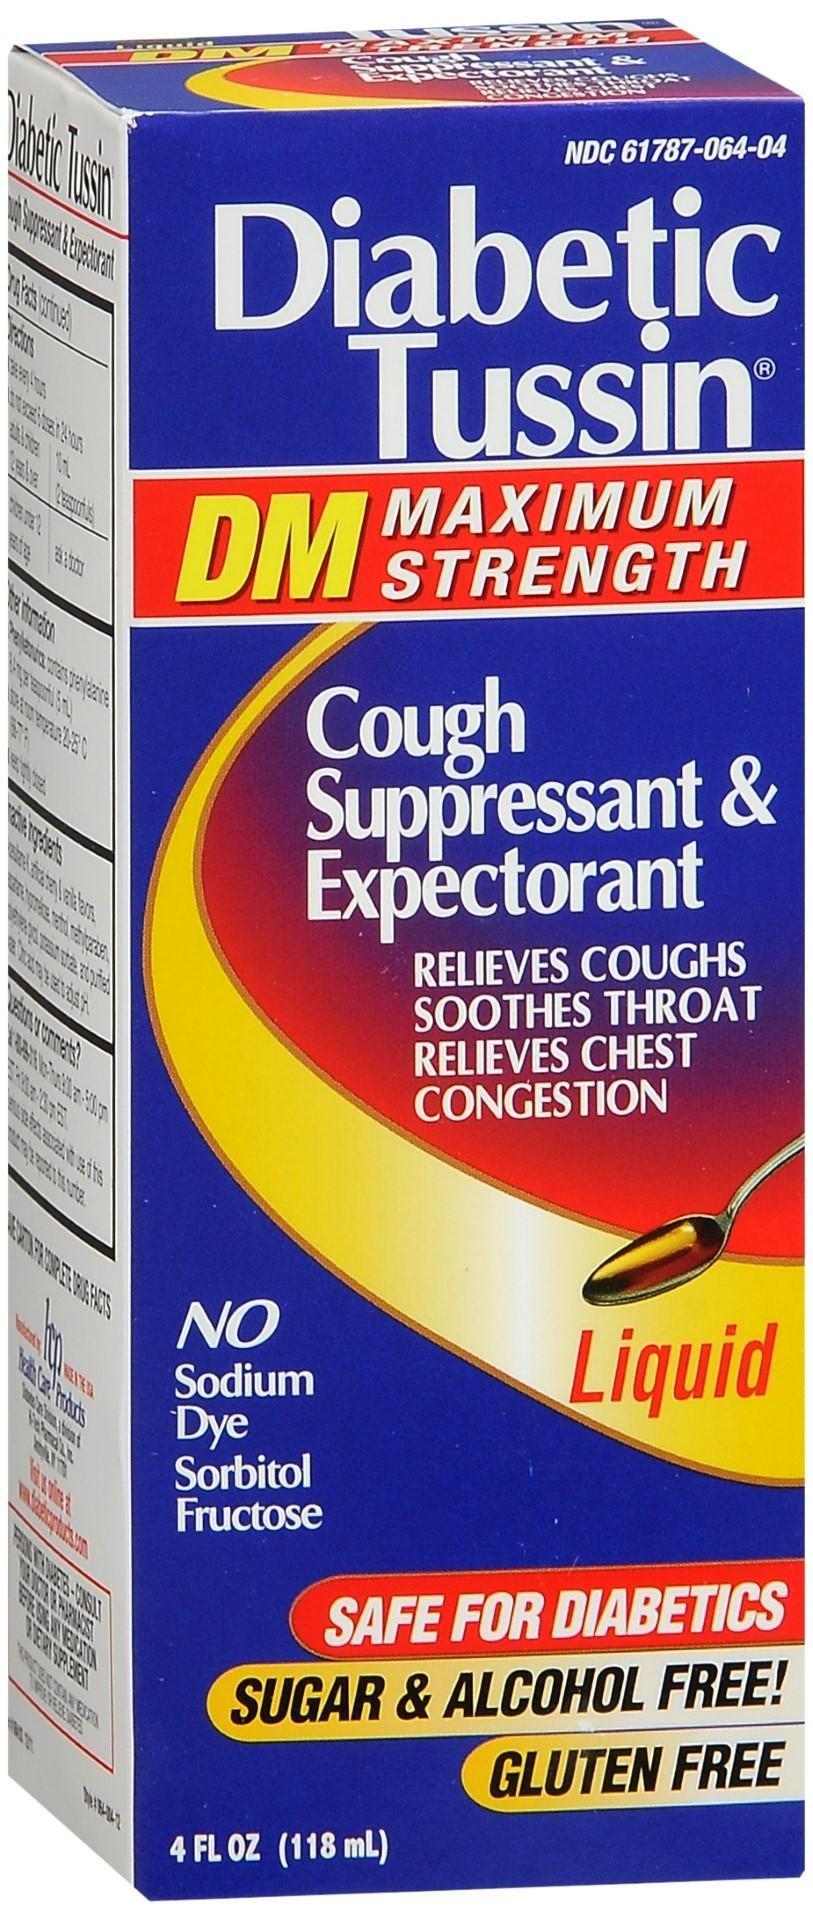 Diabetic Tussin Dm Cough Suppressant & Expectorant Liquid Maximum Strength | Asti's South Hills Pharmacy